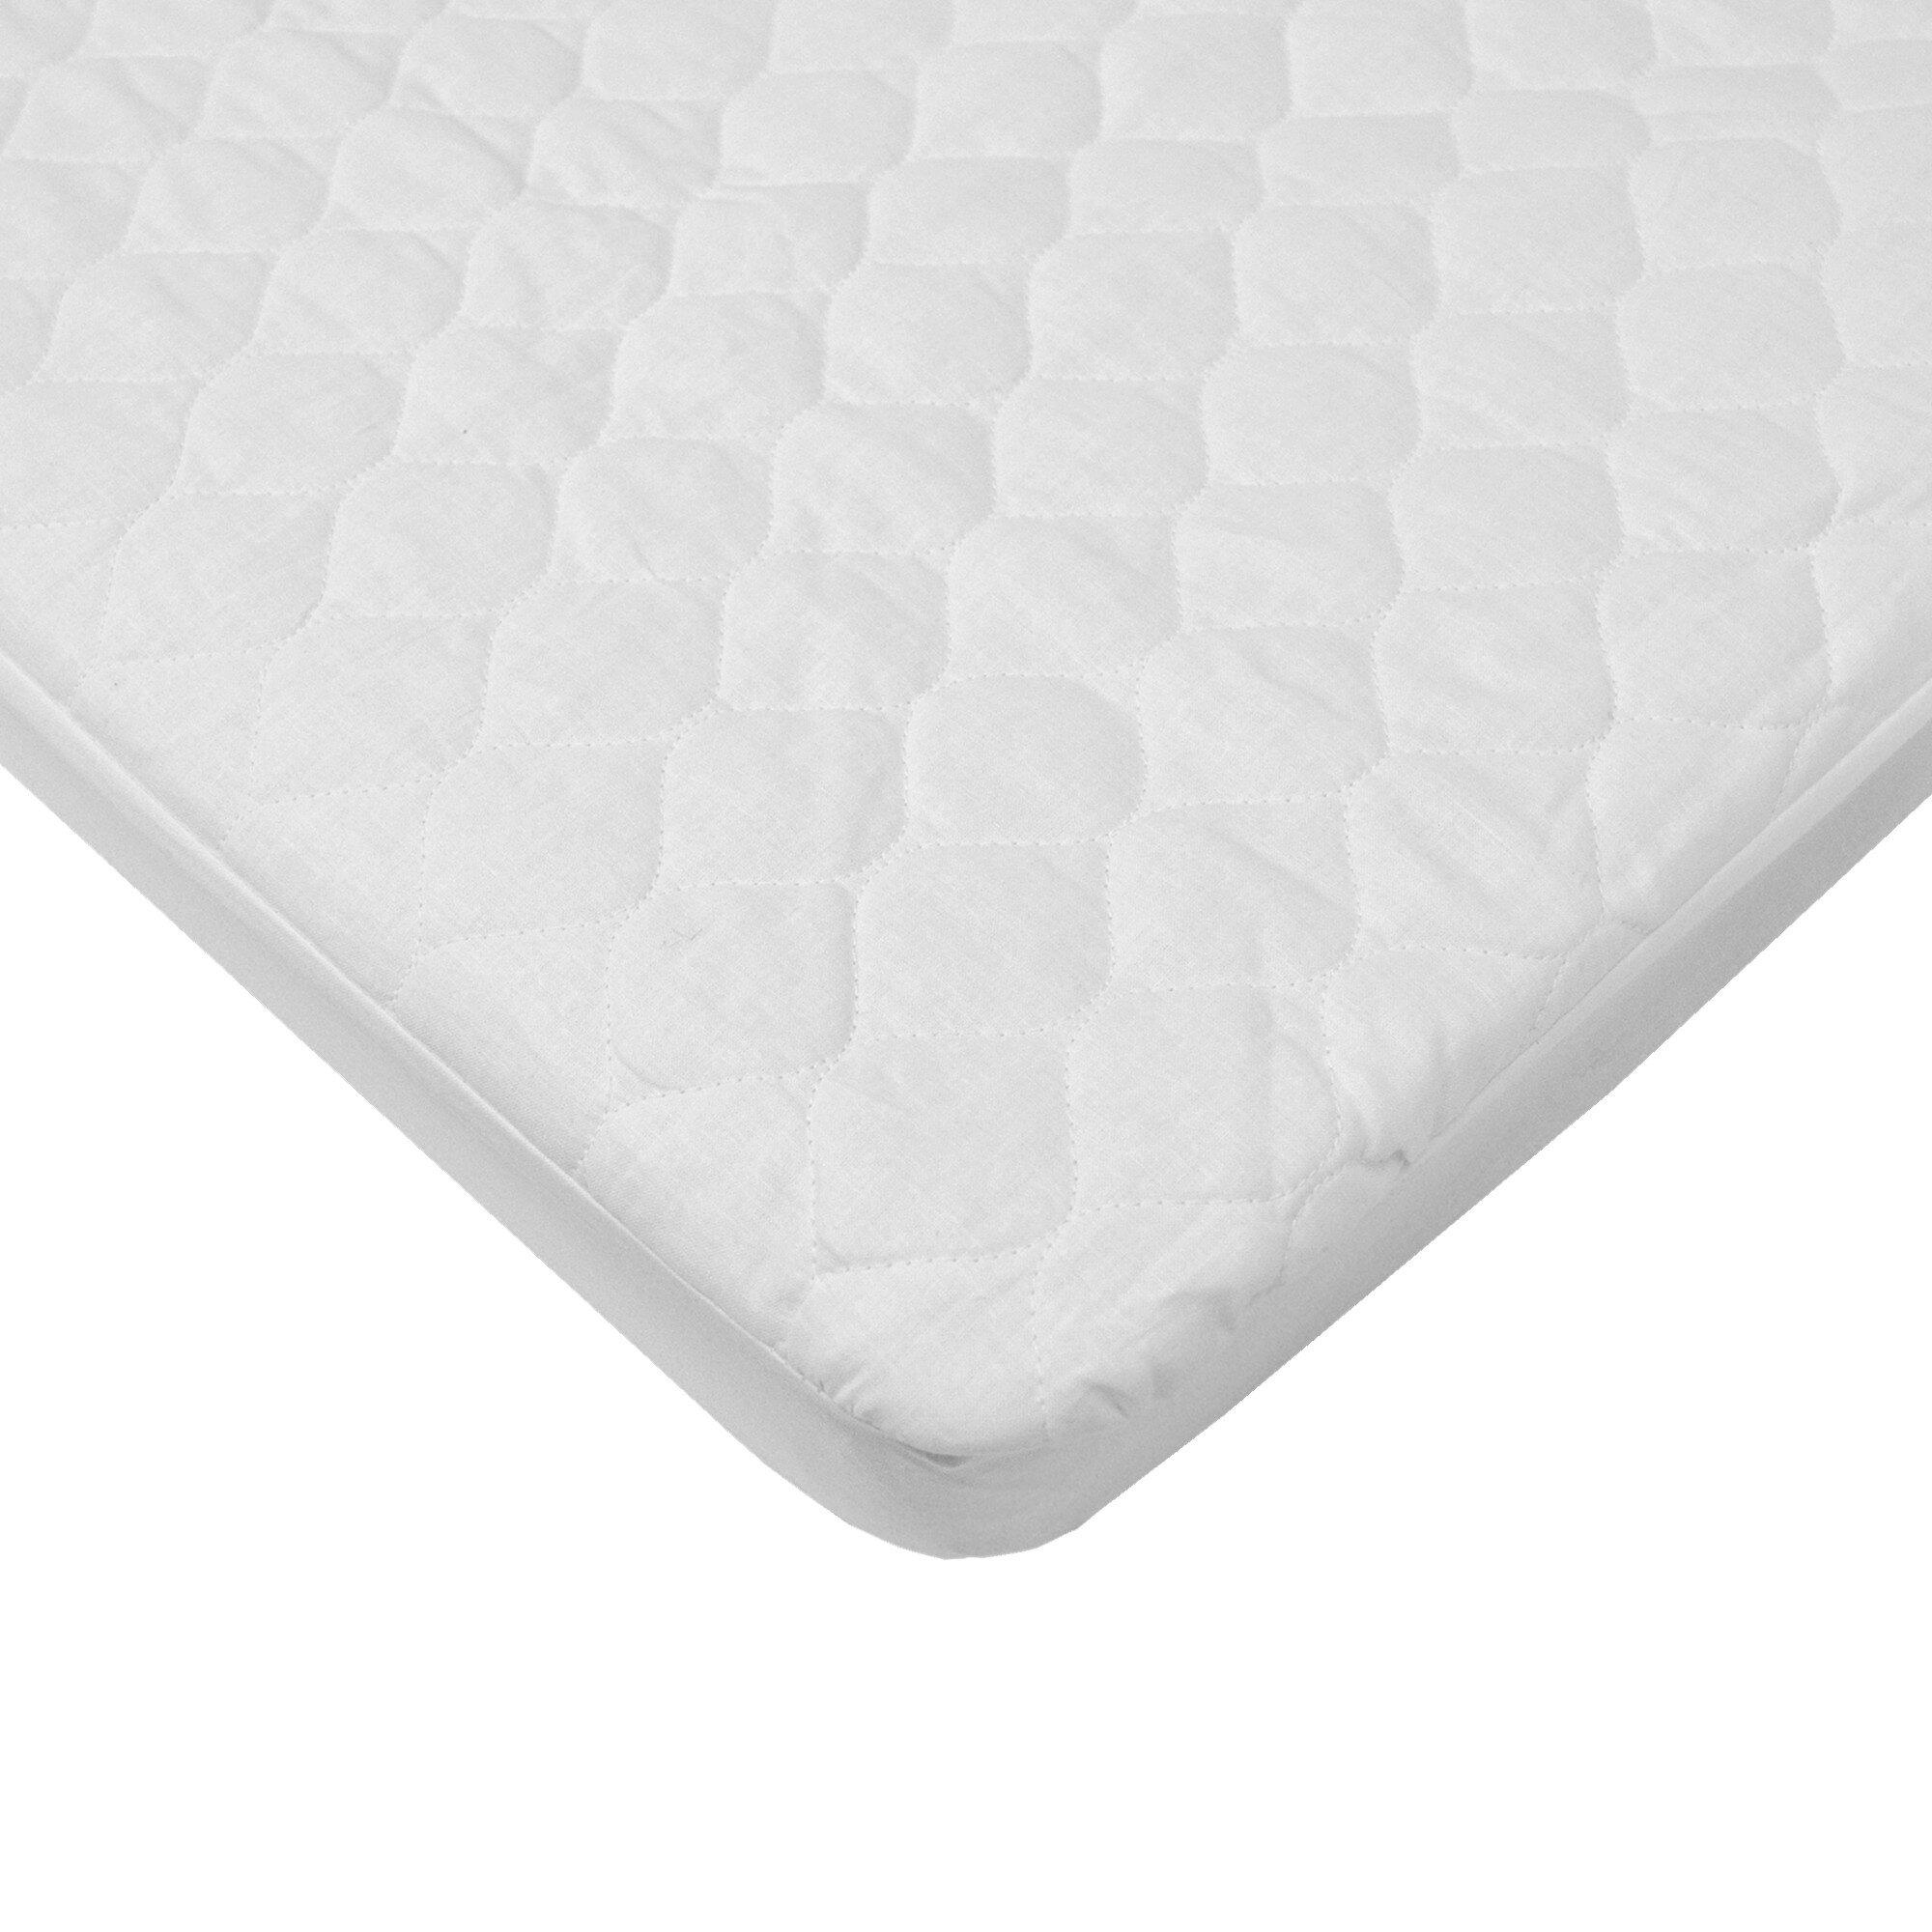 Mattress for baby crib - American Baby Company Waterproof Quilted Mini Crib Mattress Pad